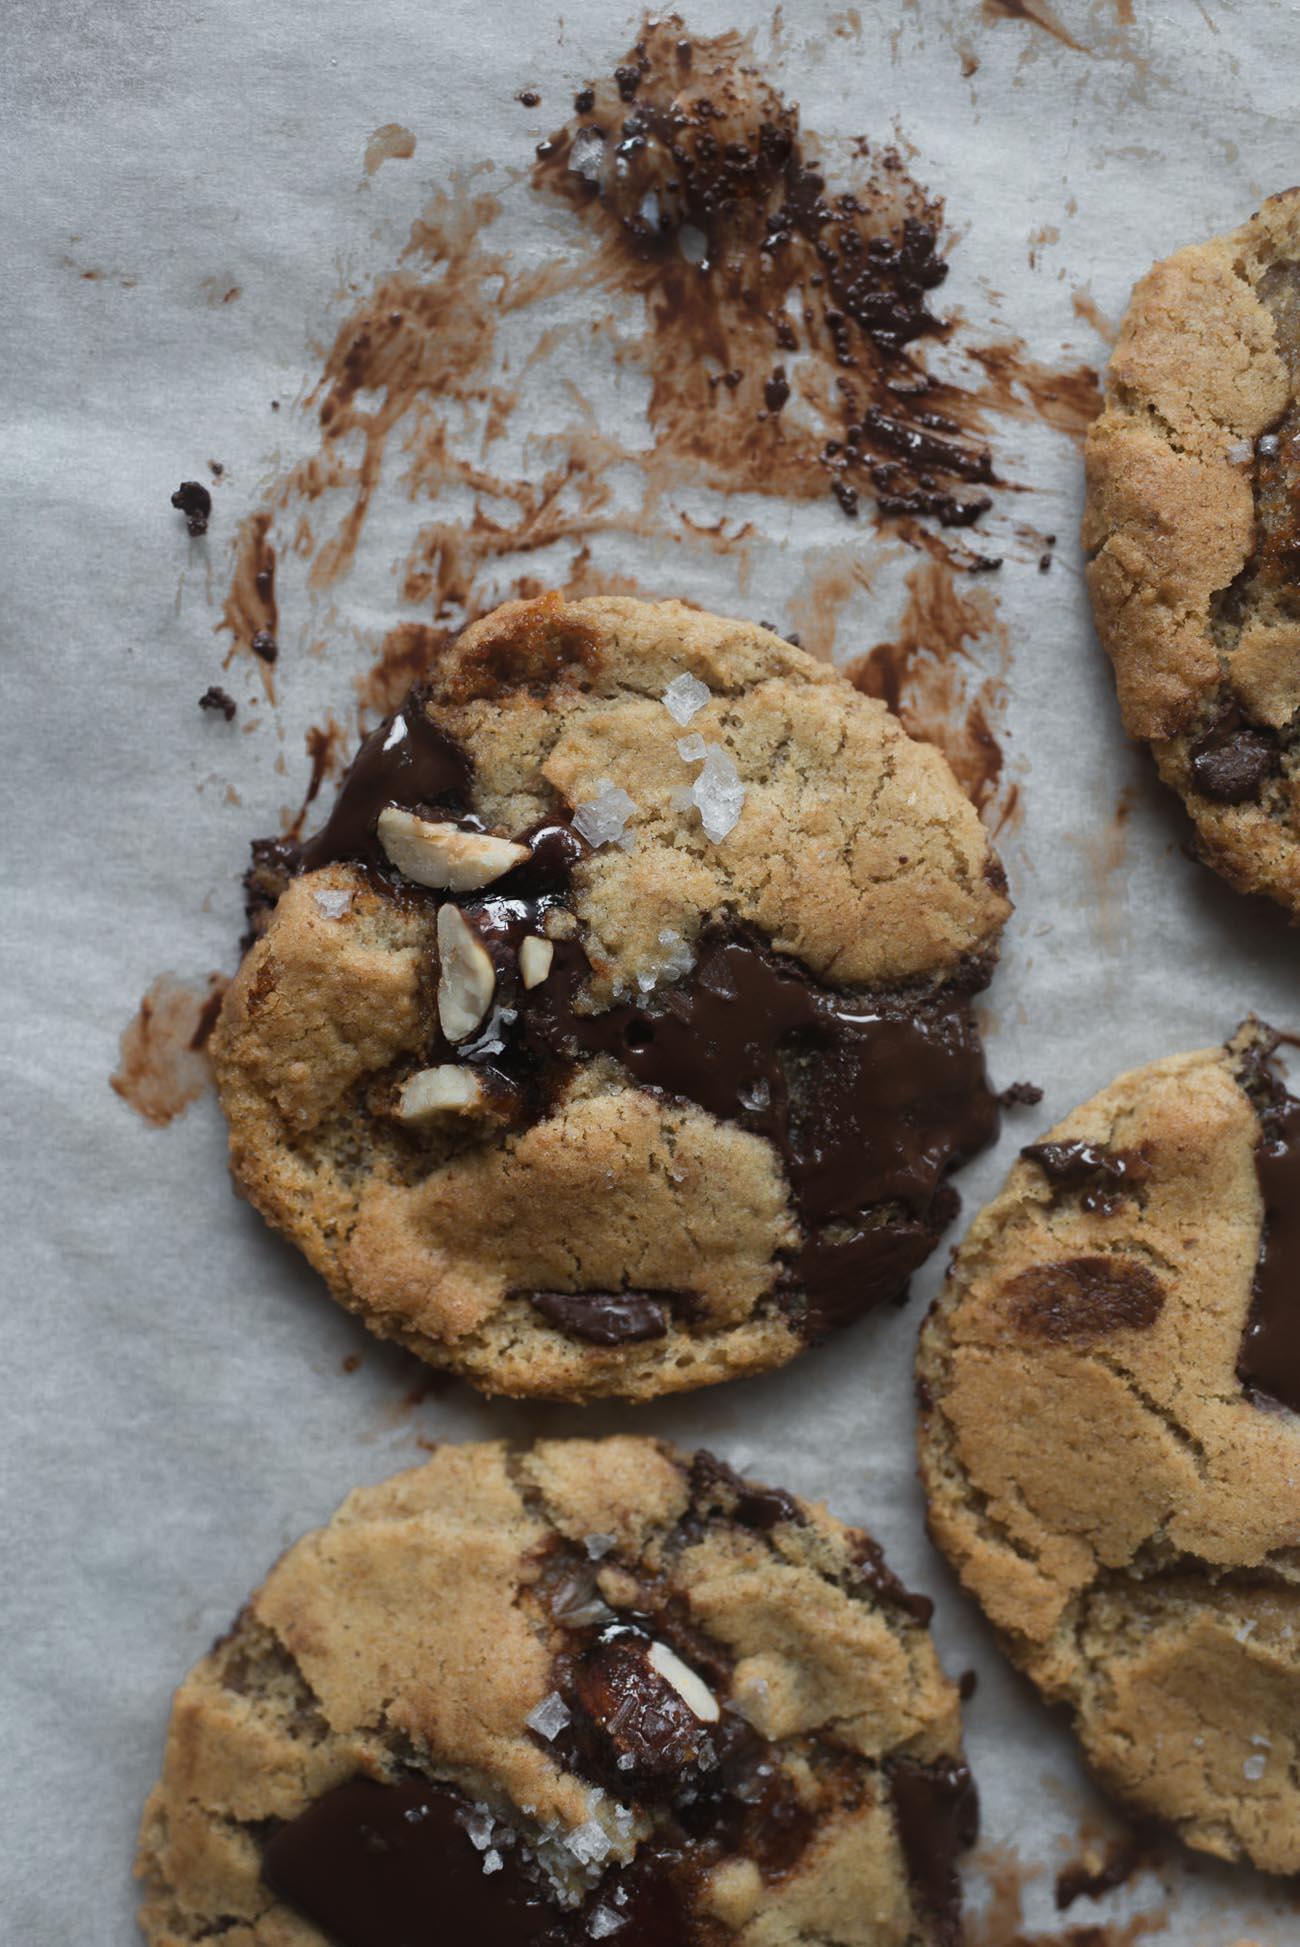 Hazelnut-Praline-and-Rye-Chocolate-Chunk-Cookies-2.jpg